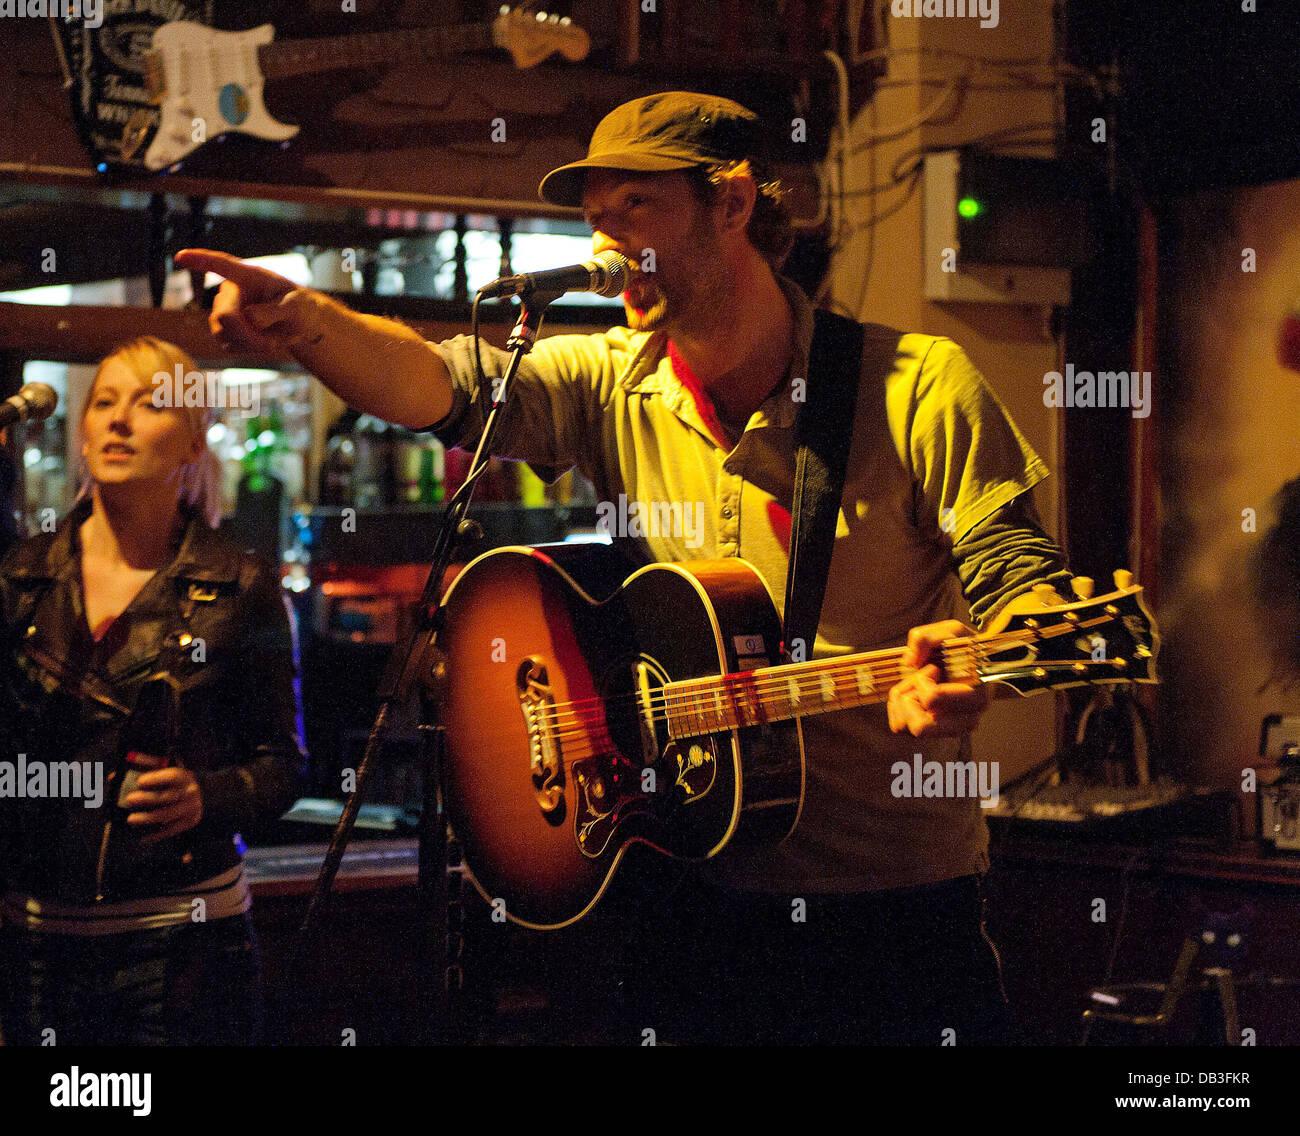 Chris Martin of Coldplay performs at Boogaloo. London, England - 13.04.11 - Stock Image